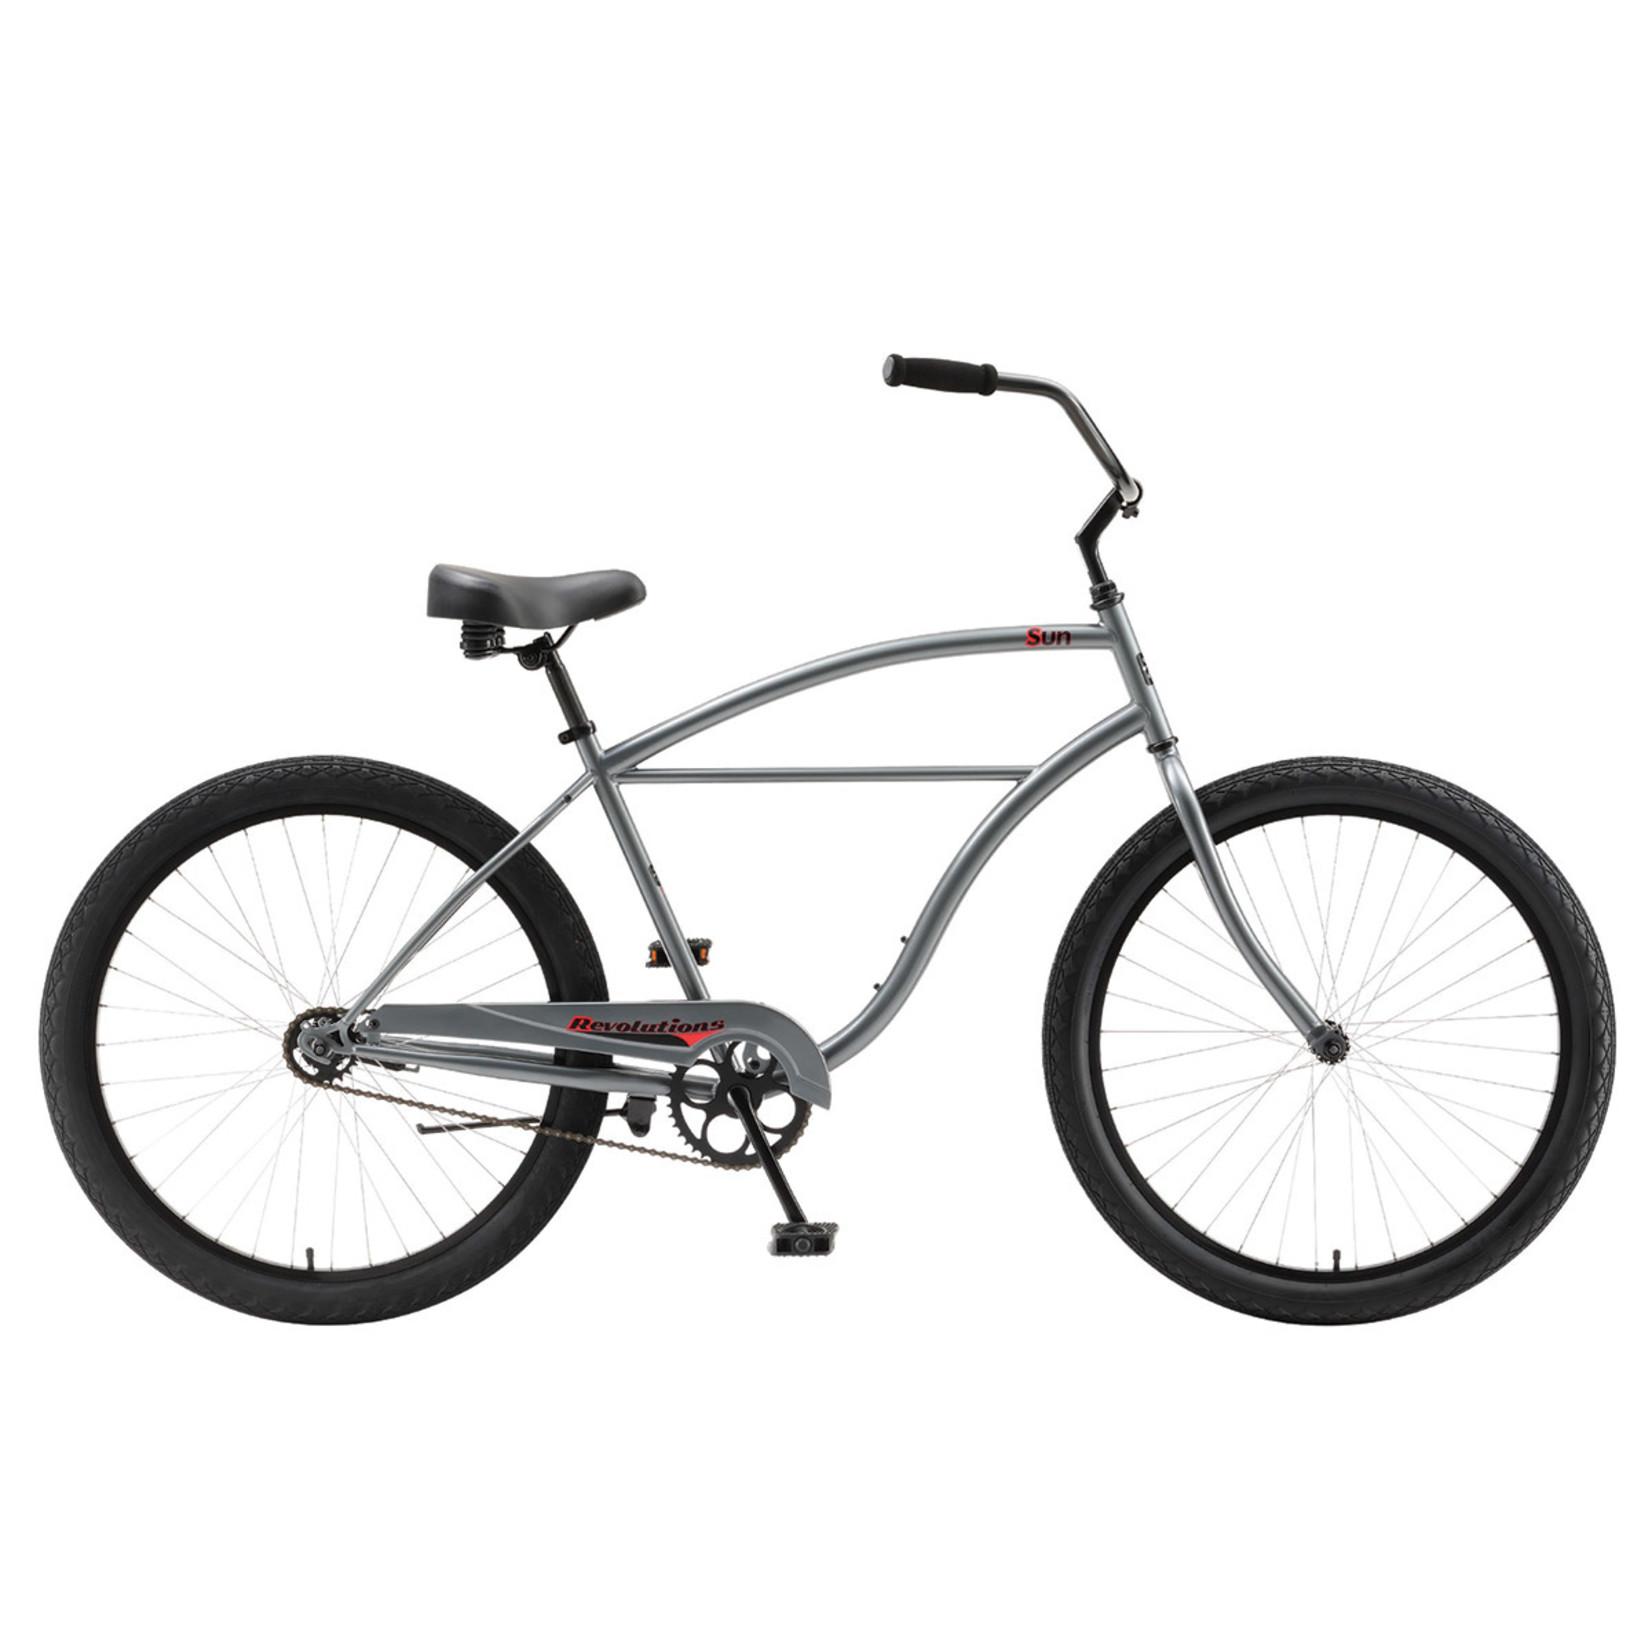 SUN BICYCLE REVOLUTION CB-26